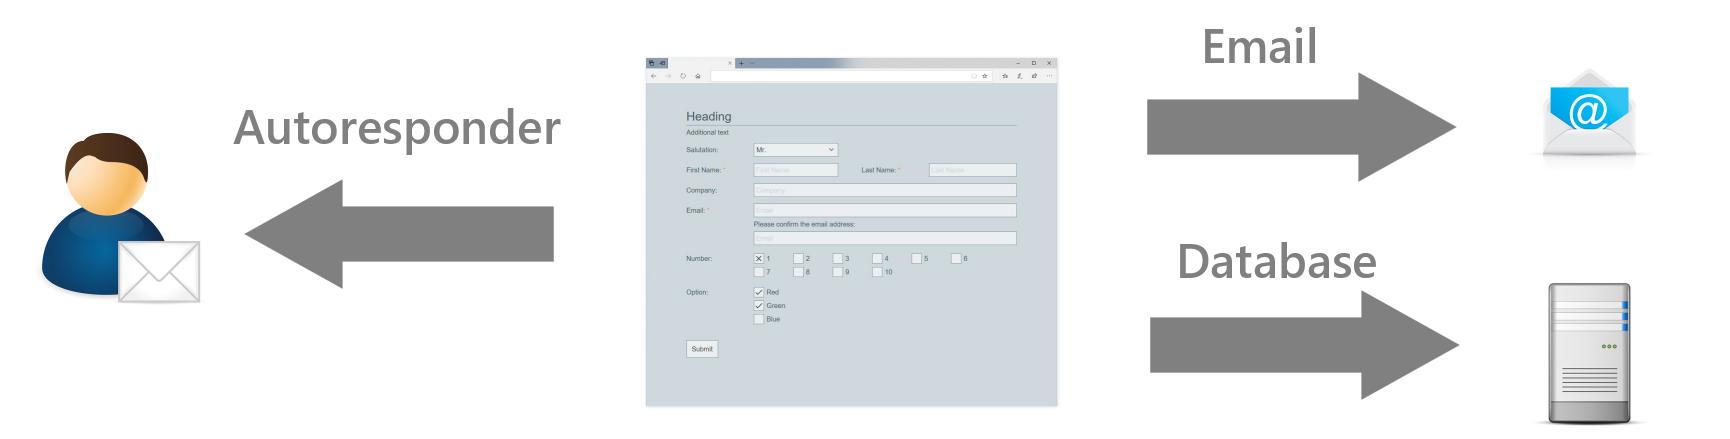 Arclab® Web Form Builder | Submission Tasks